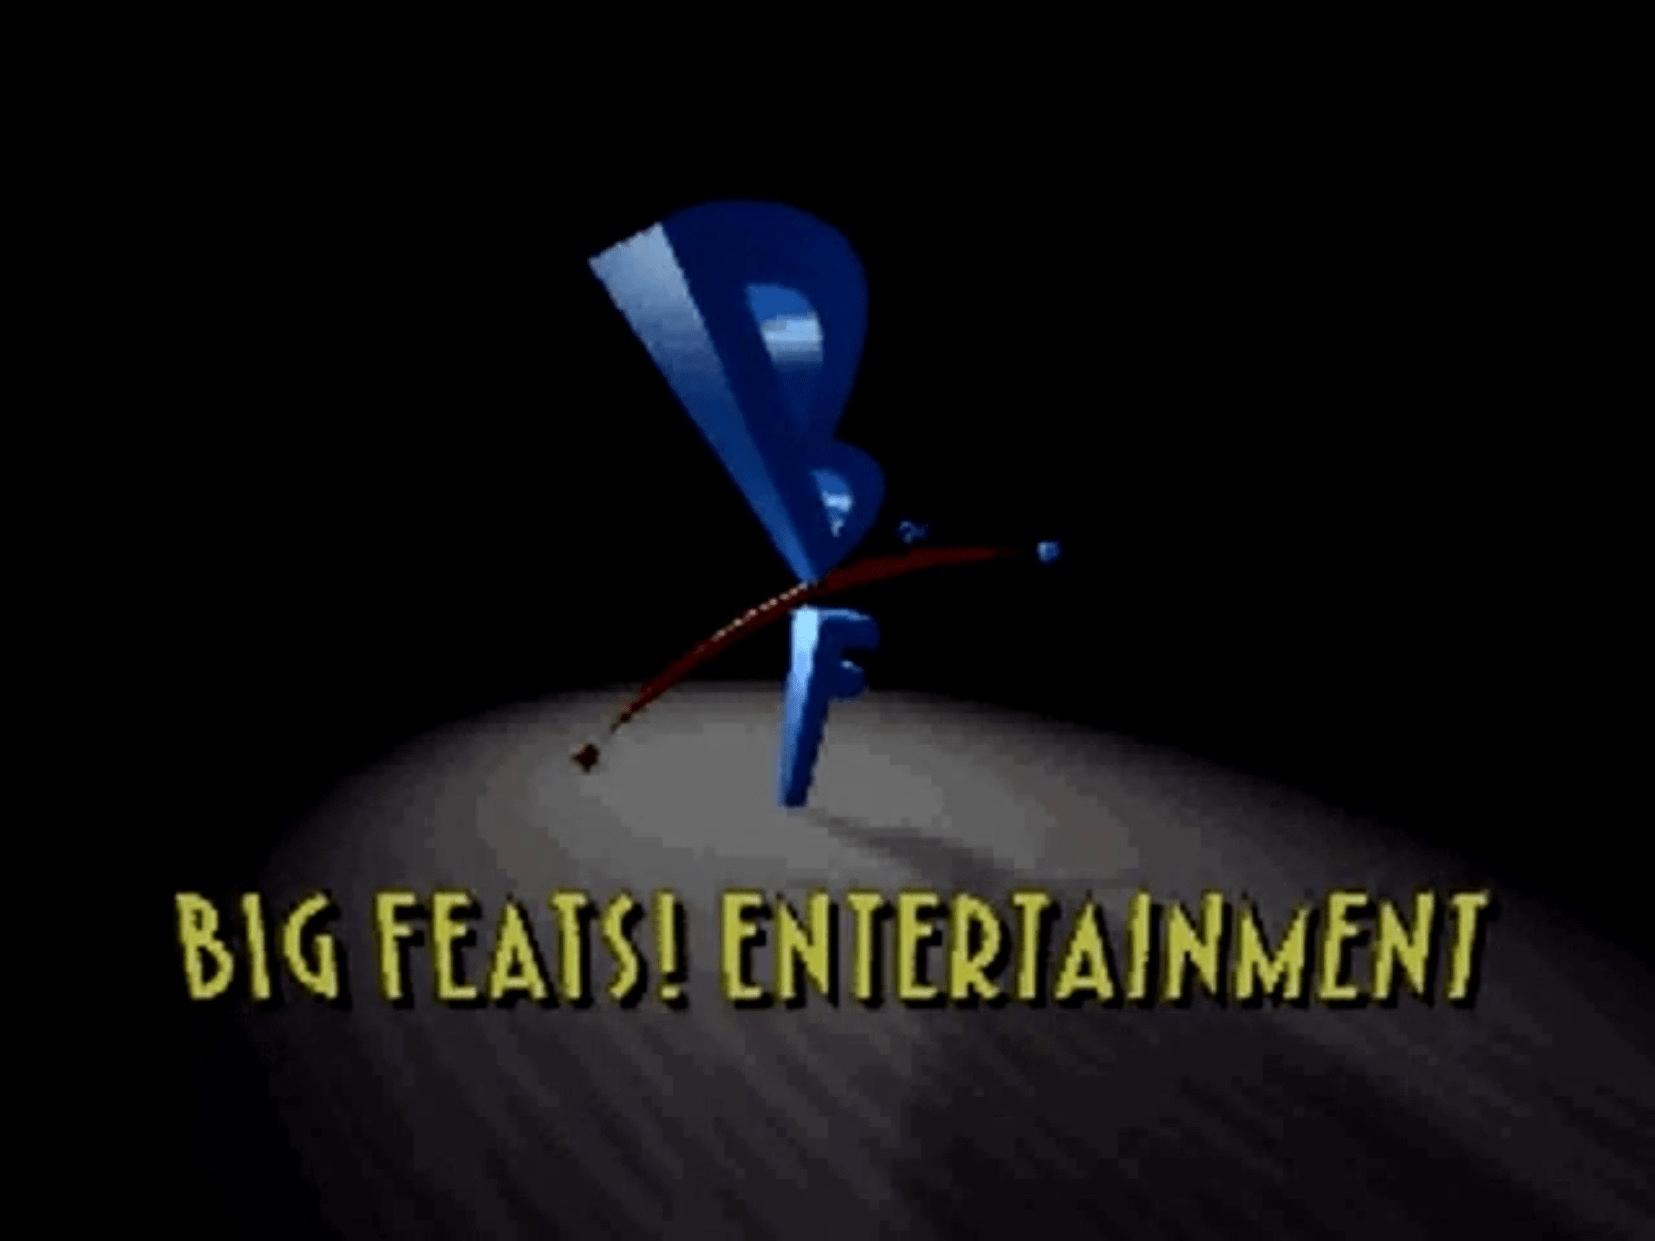 Big Feats! Entertainment